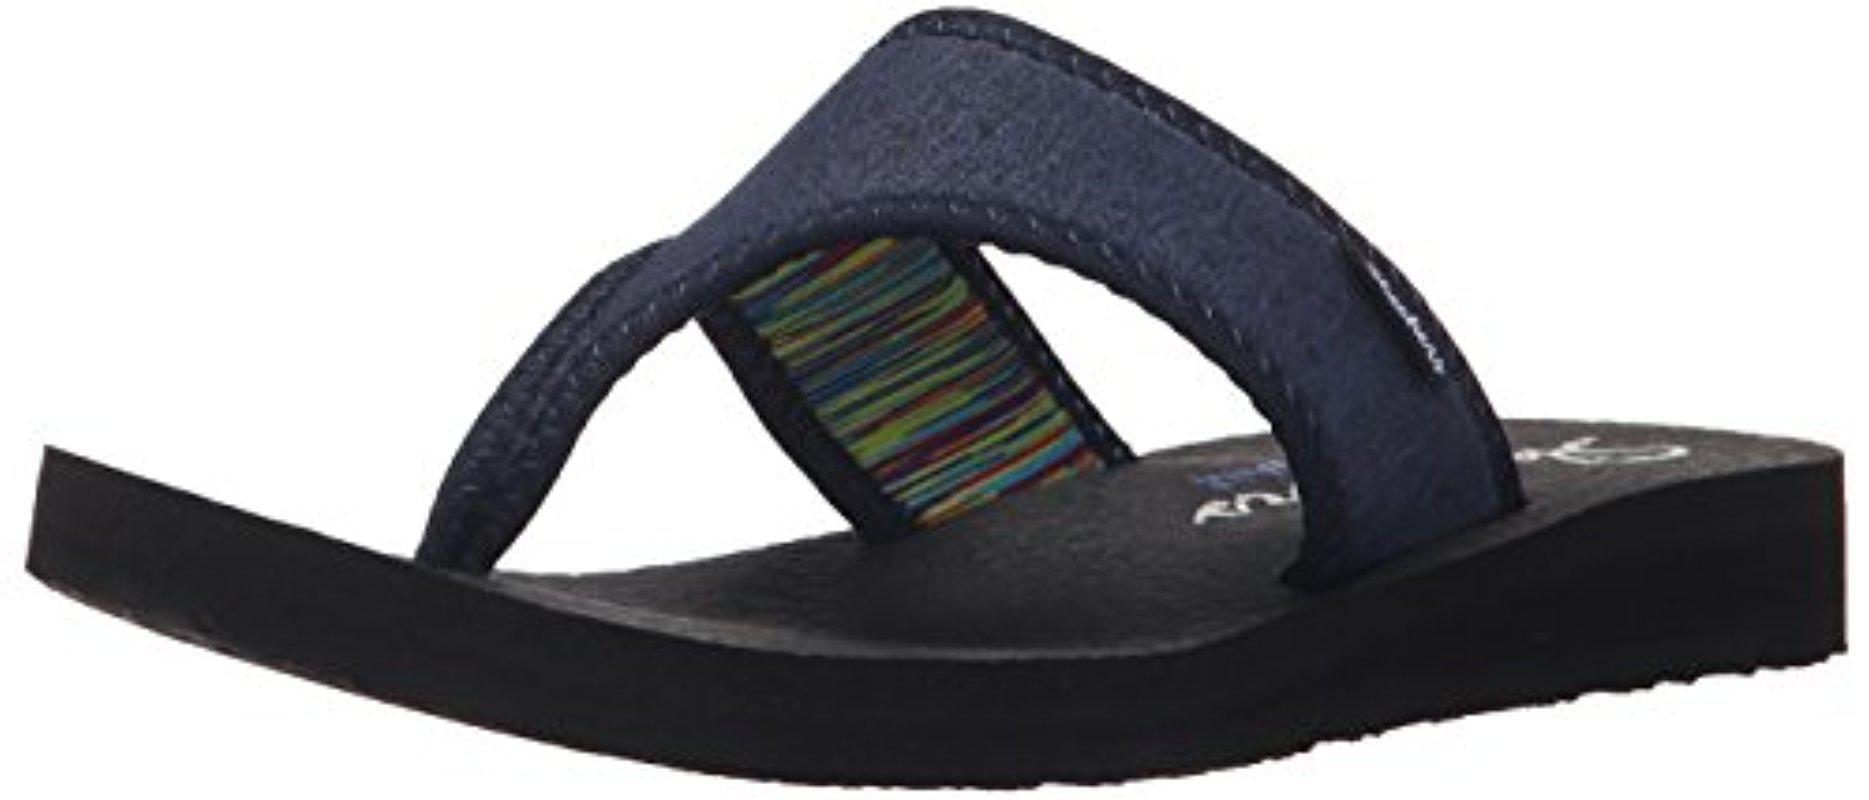 Skechers. Women's Blue Cali Meditation Zen Child Flip-flop